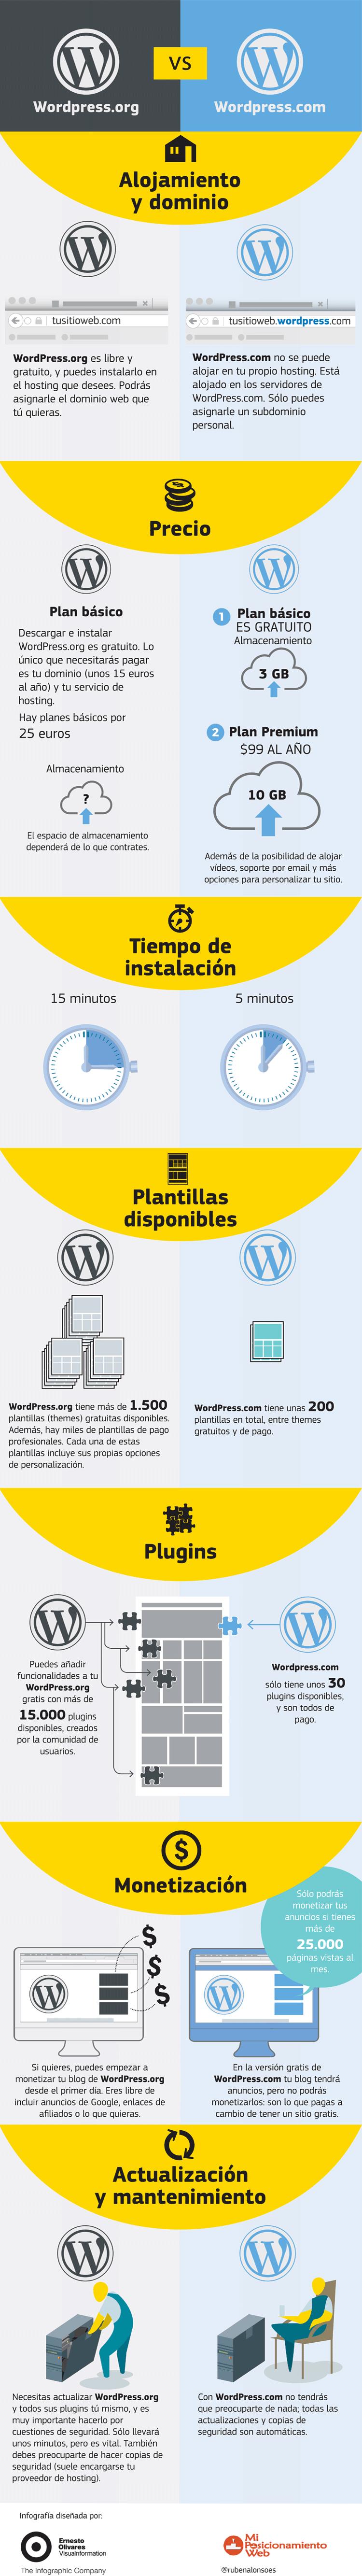 WordPress.com vs WordPress.org - Infografía